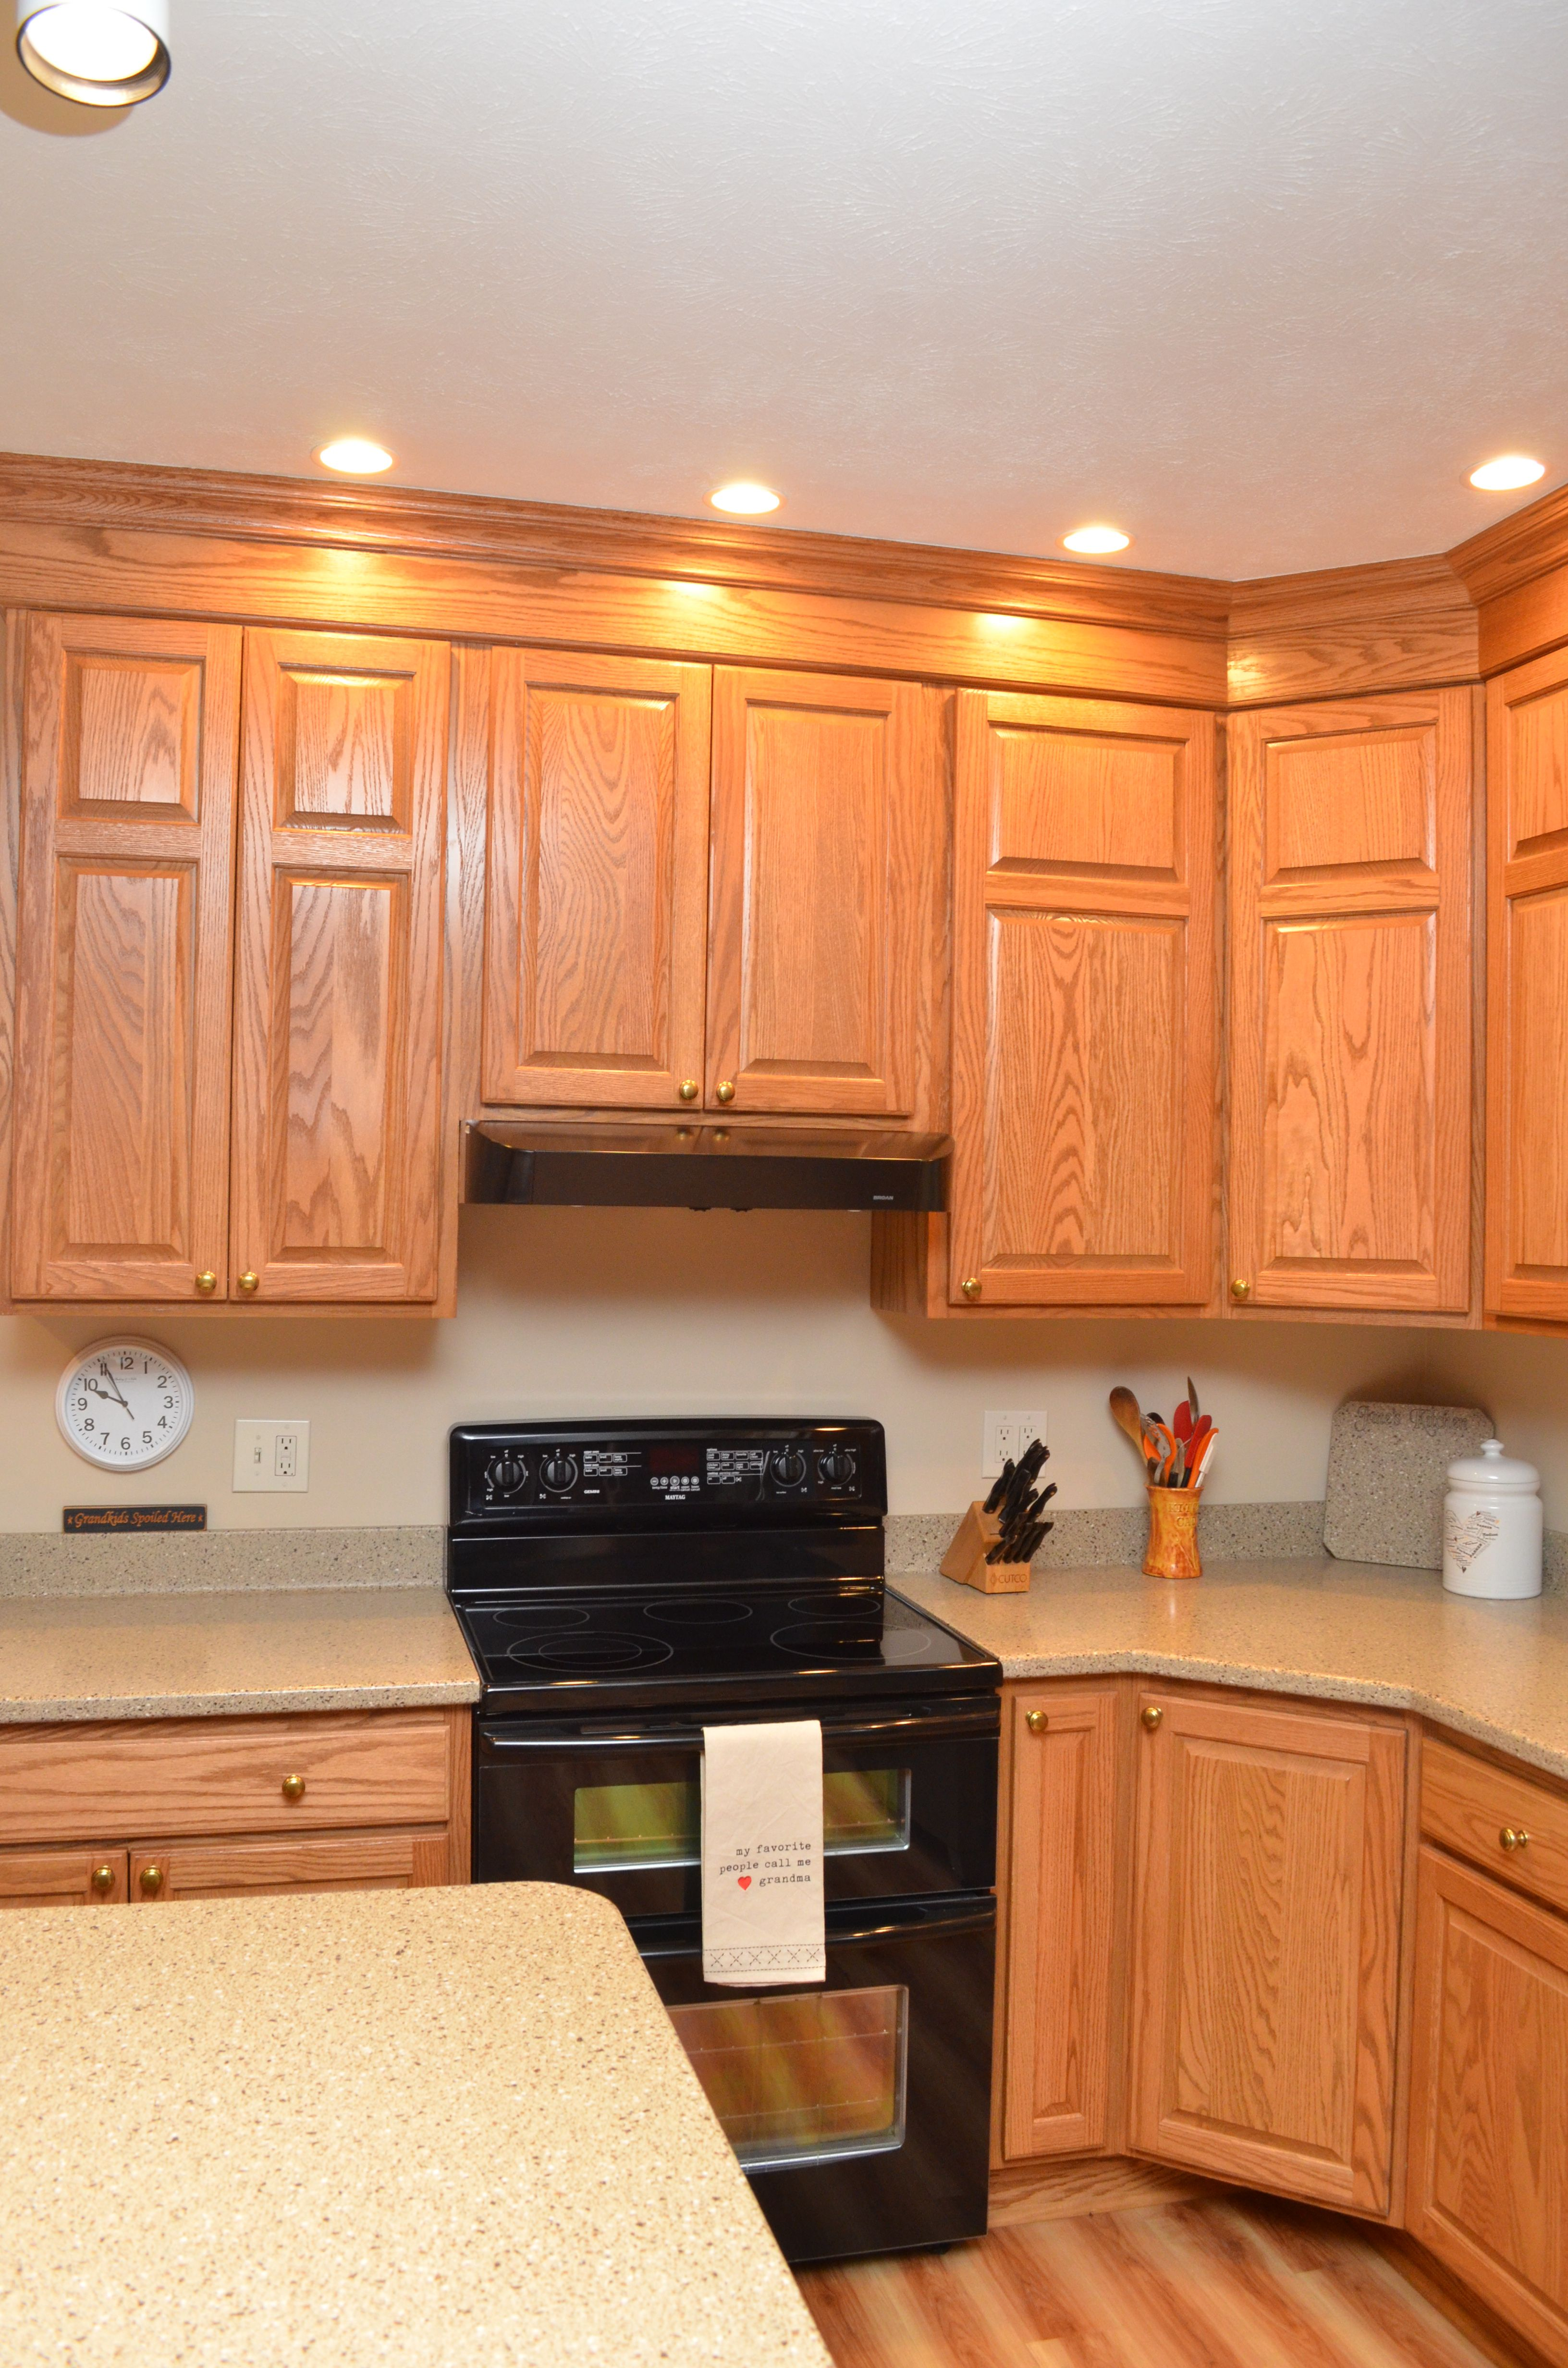 Haas Cabinetry Wood Species: Oak Cabinet Finish: Honey ...